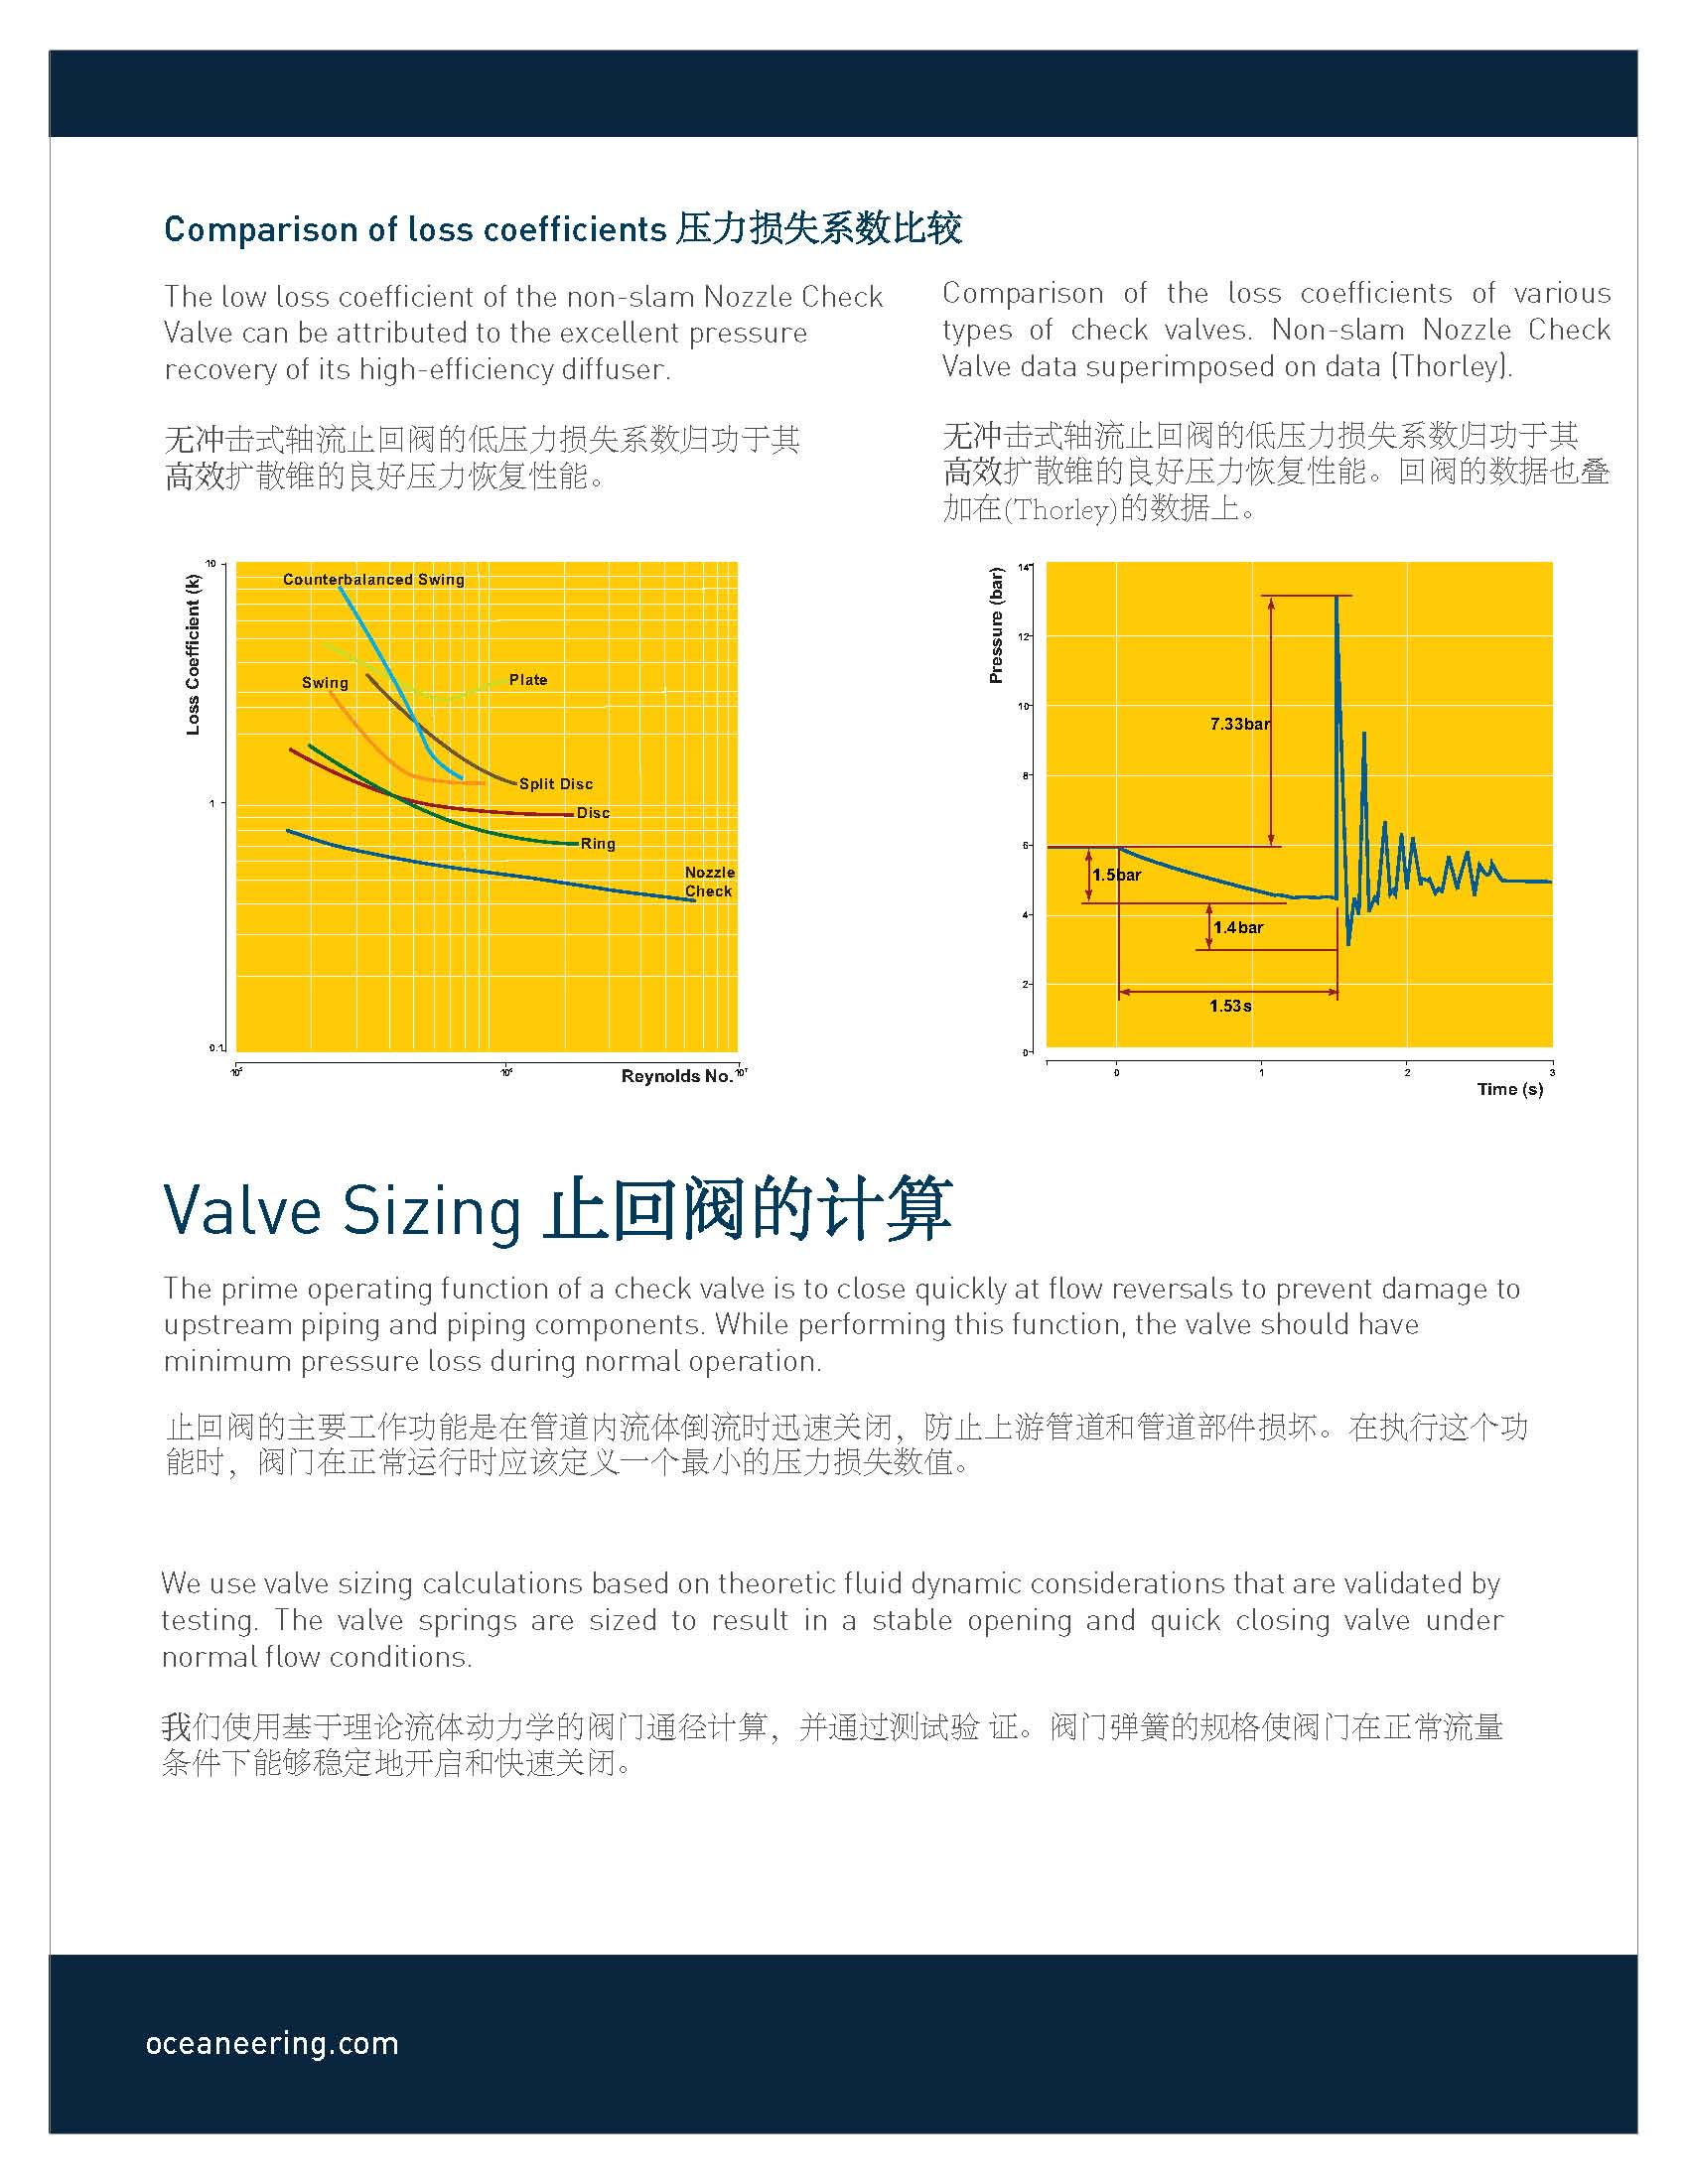 12Catalog-GraylocNozzleCheckValve-Chinese_页面_06